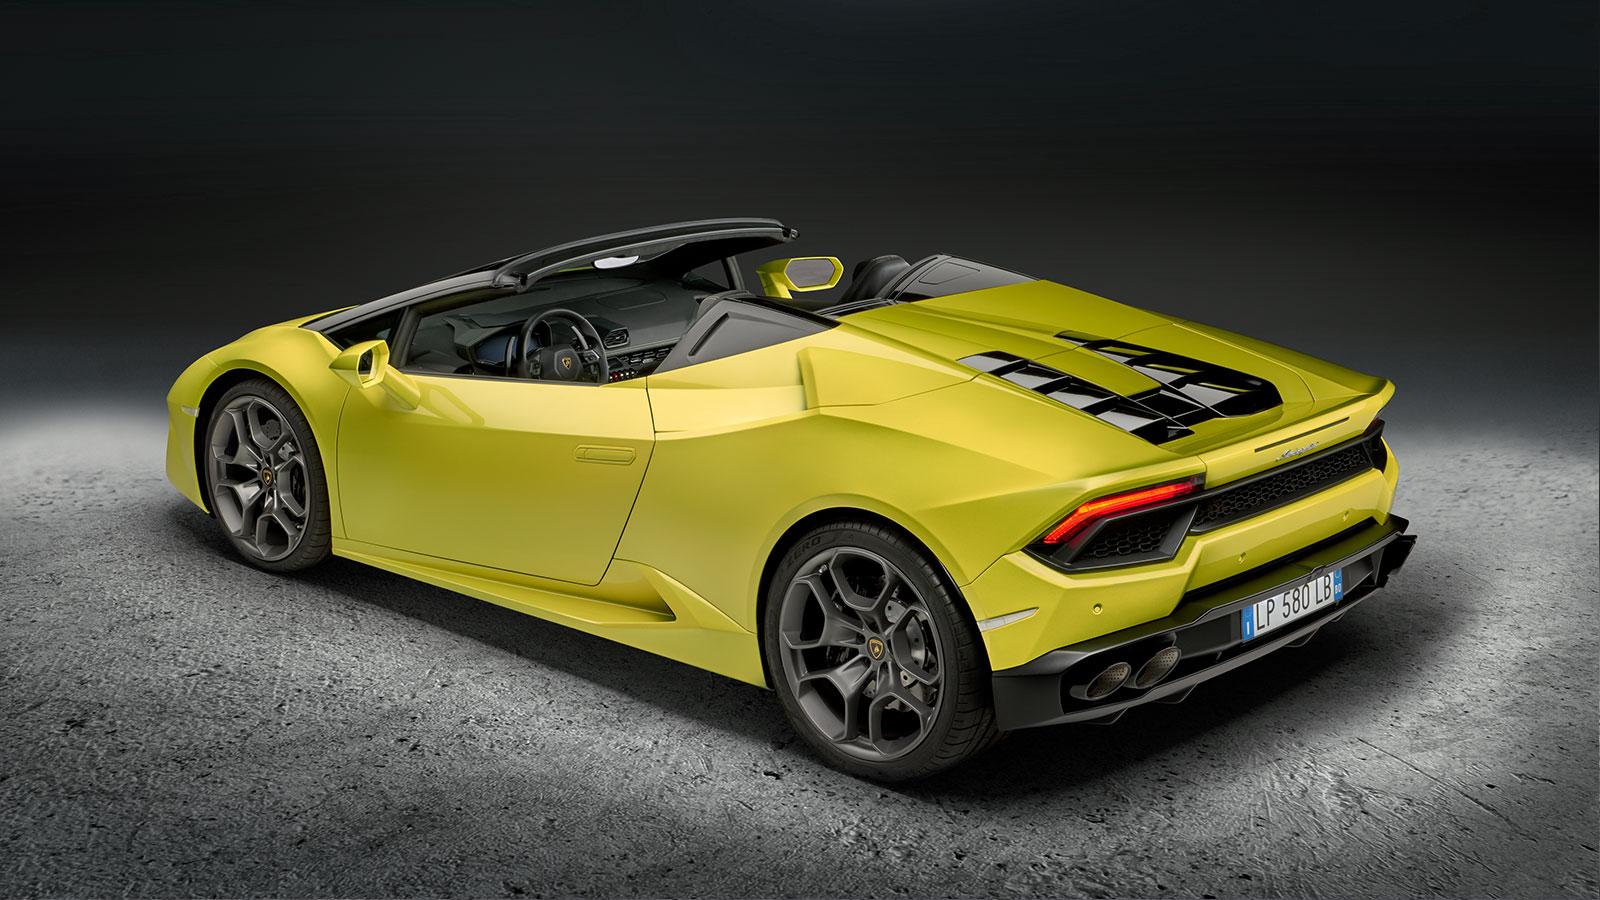 Lamborghini Huracan RWD Spyder - Breathtaking Technology image 12